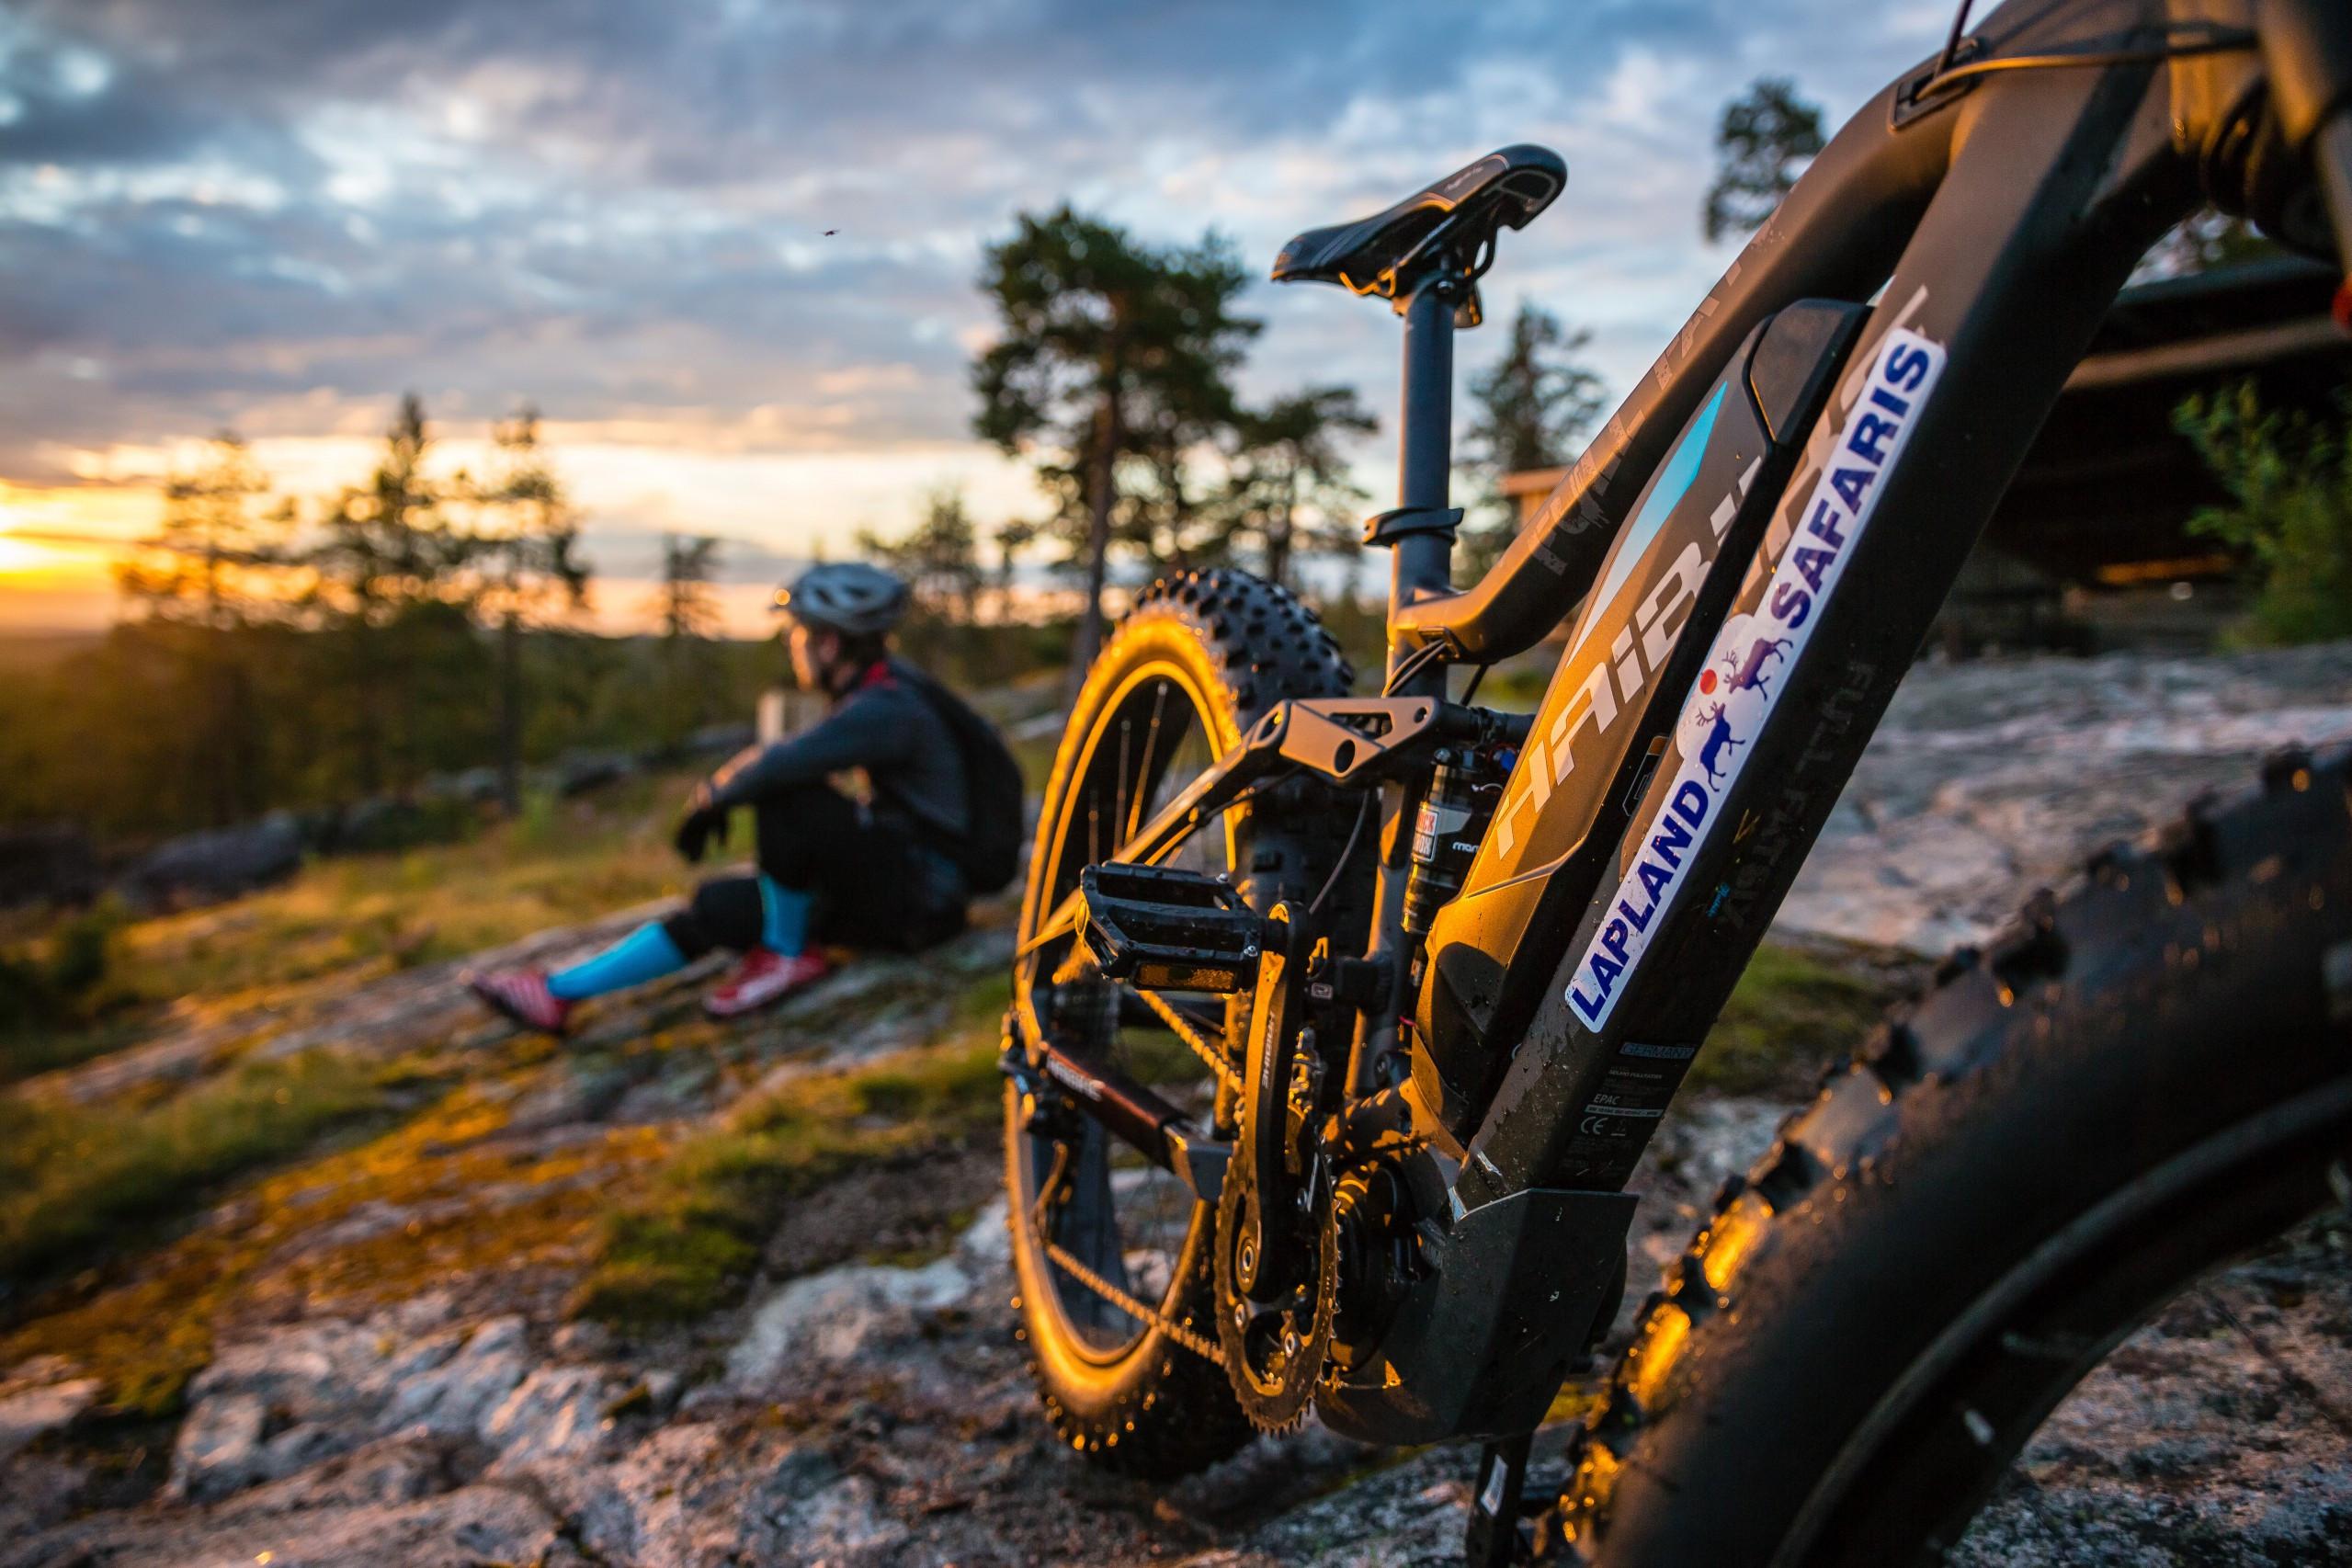 Lapland_-_E-Fatbike_16(c)LaplandSafarisNorthOy.jpg